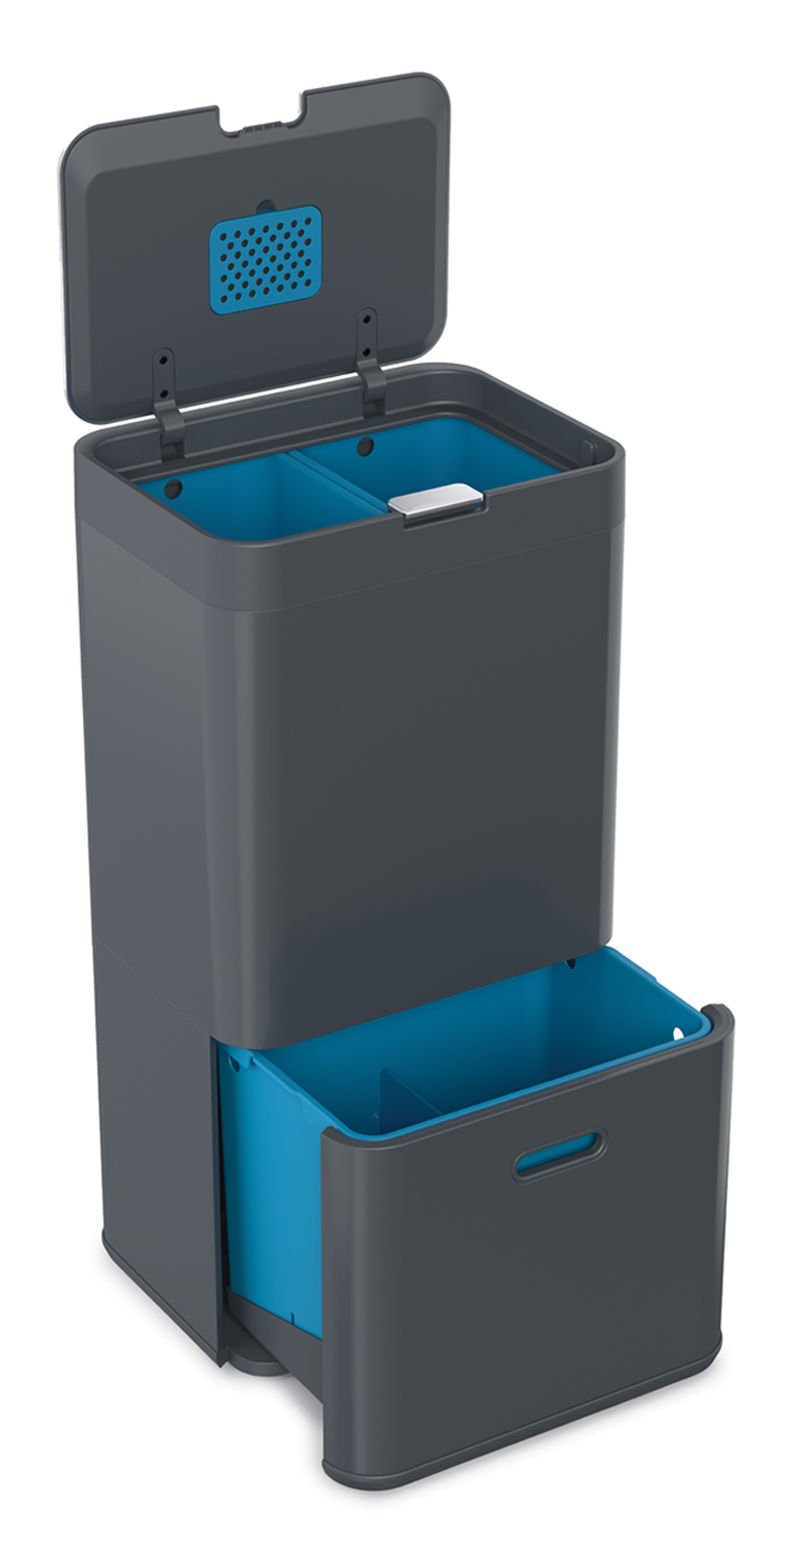 Küche - Mülleimer - Totem 58 Abfallbehälter / 58 l - 4 Fächer - Joseph Joseph - Anthrazit - Plastikmaterial, Stahl